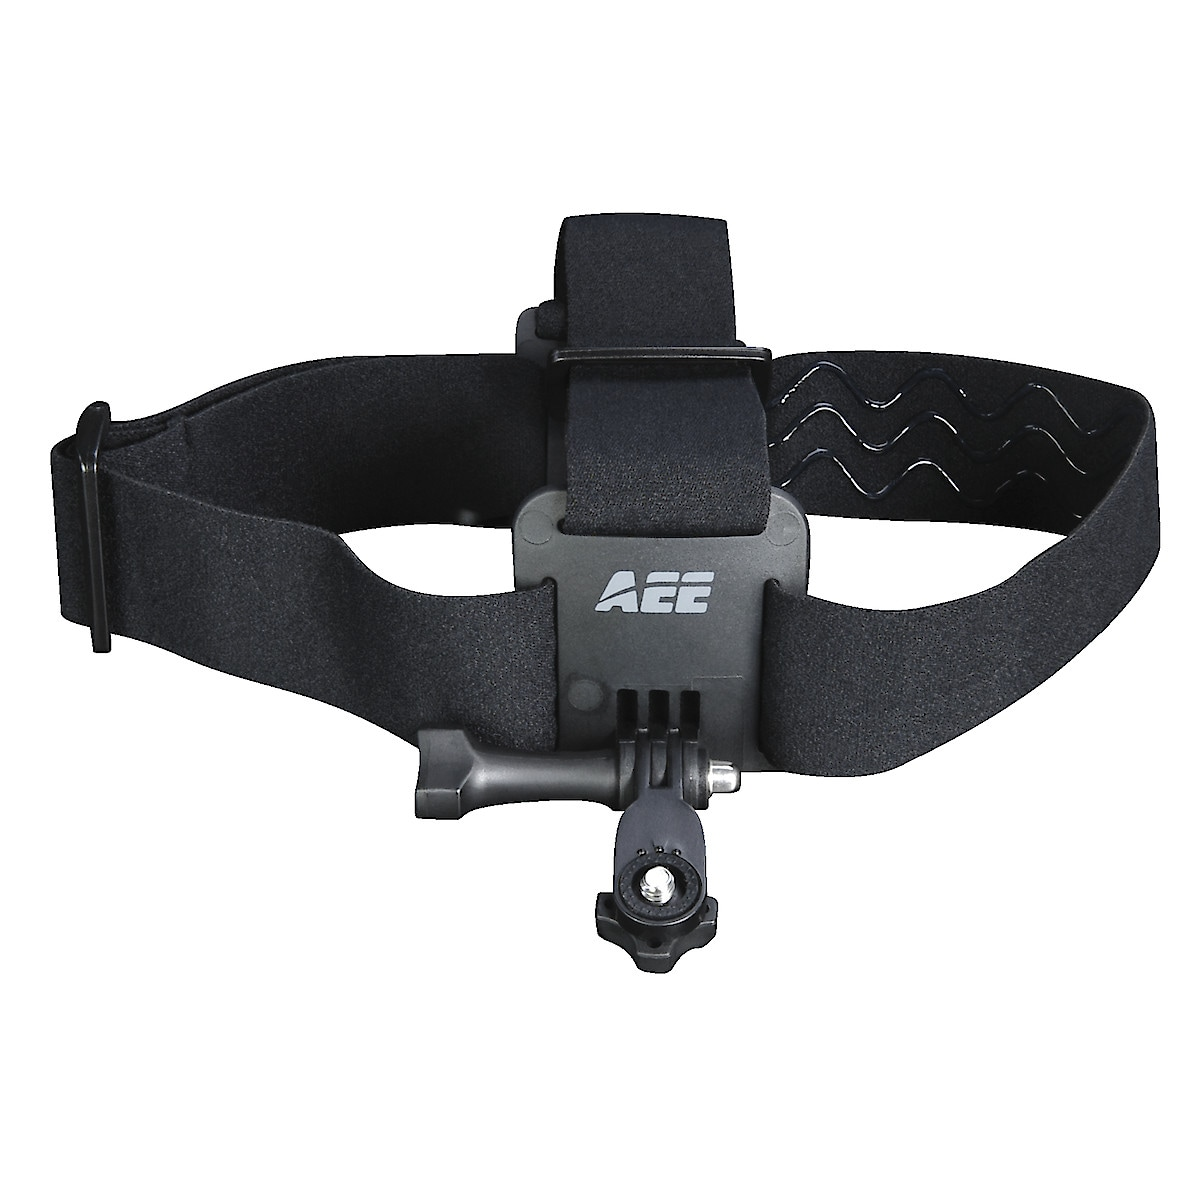 AEE Action Camera Head Strap Mount